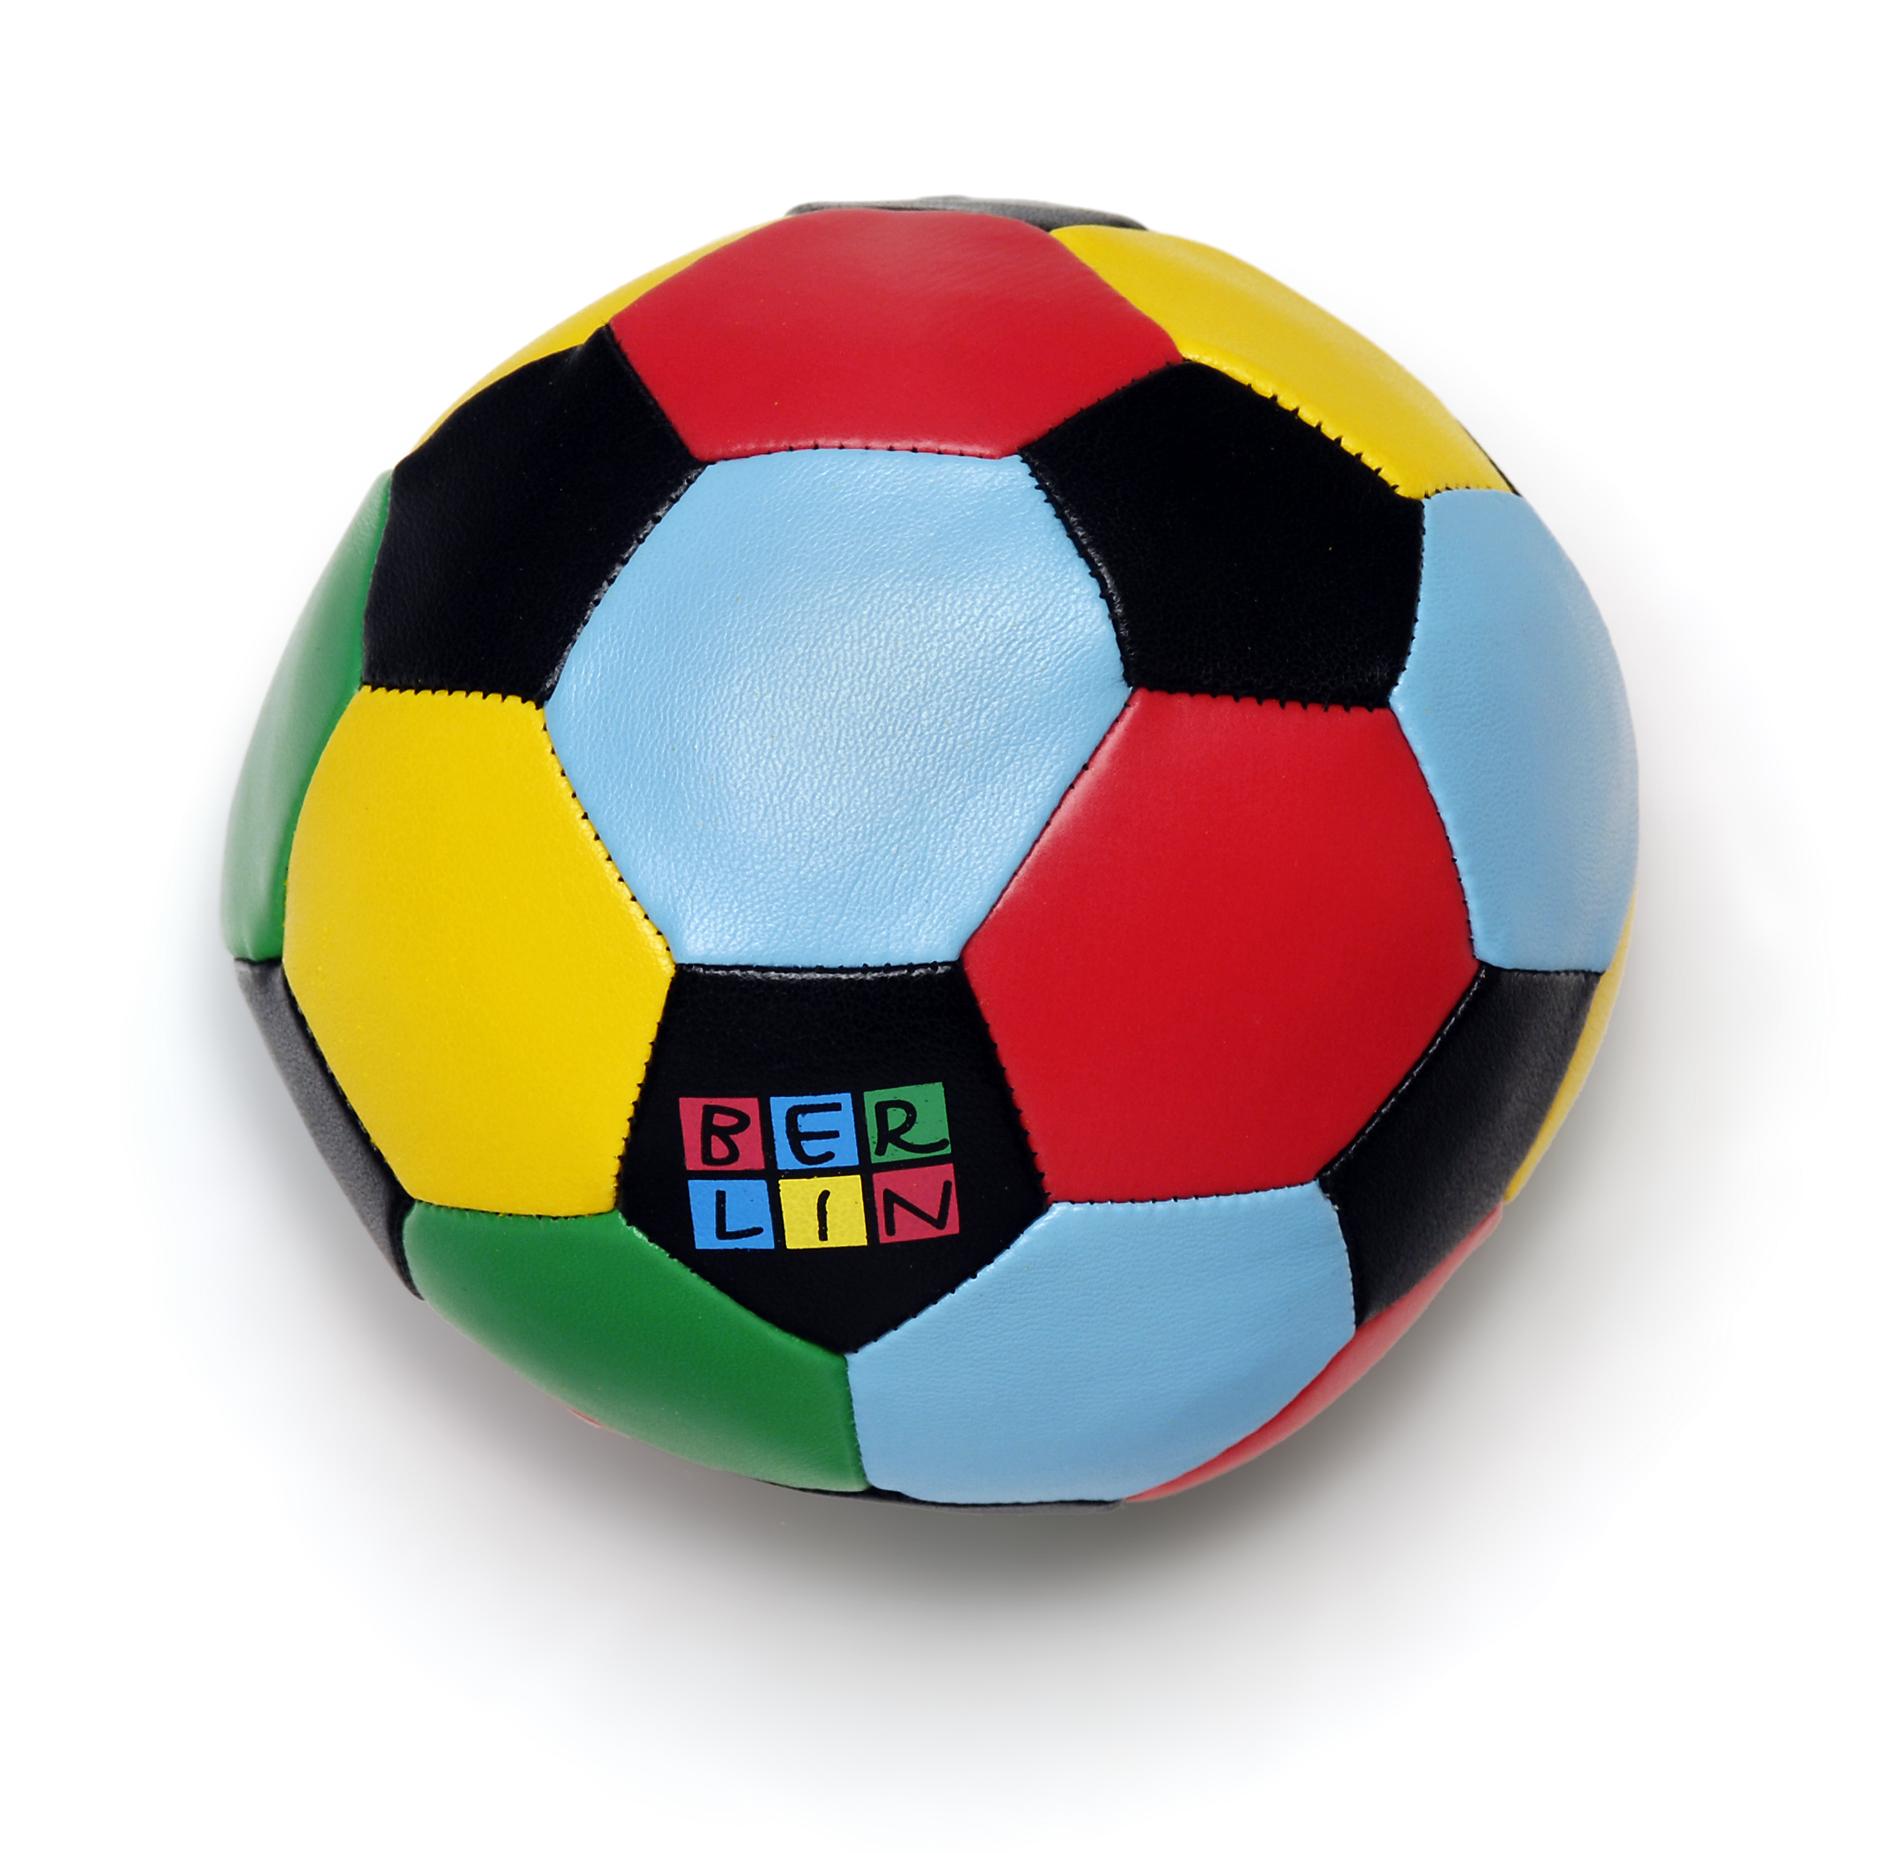 100-4001_Knautschball